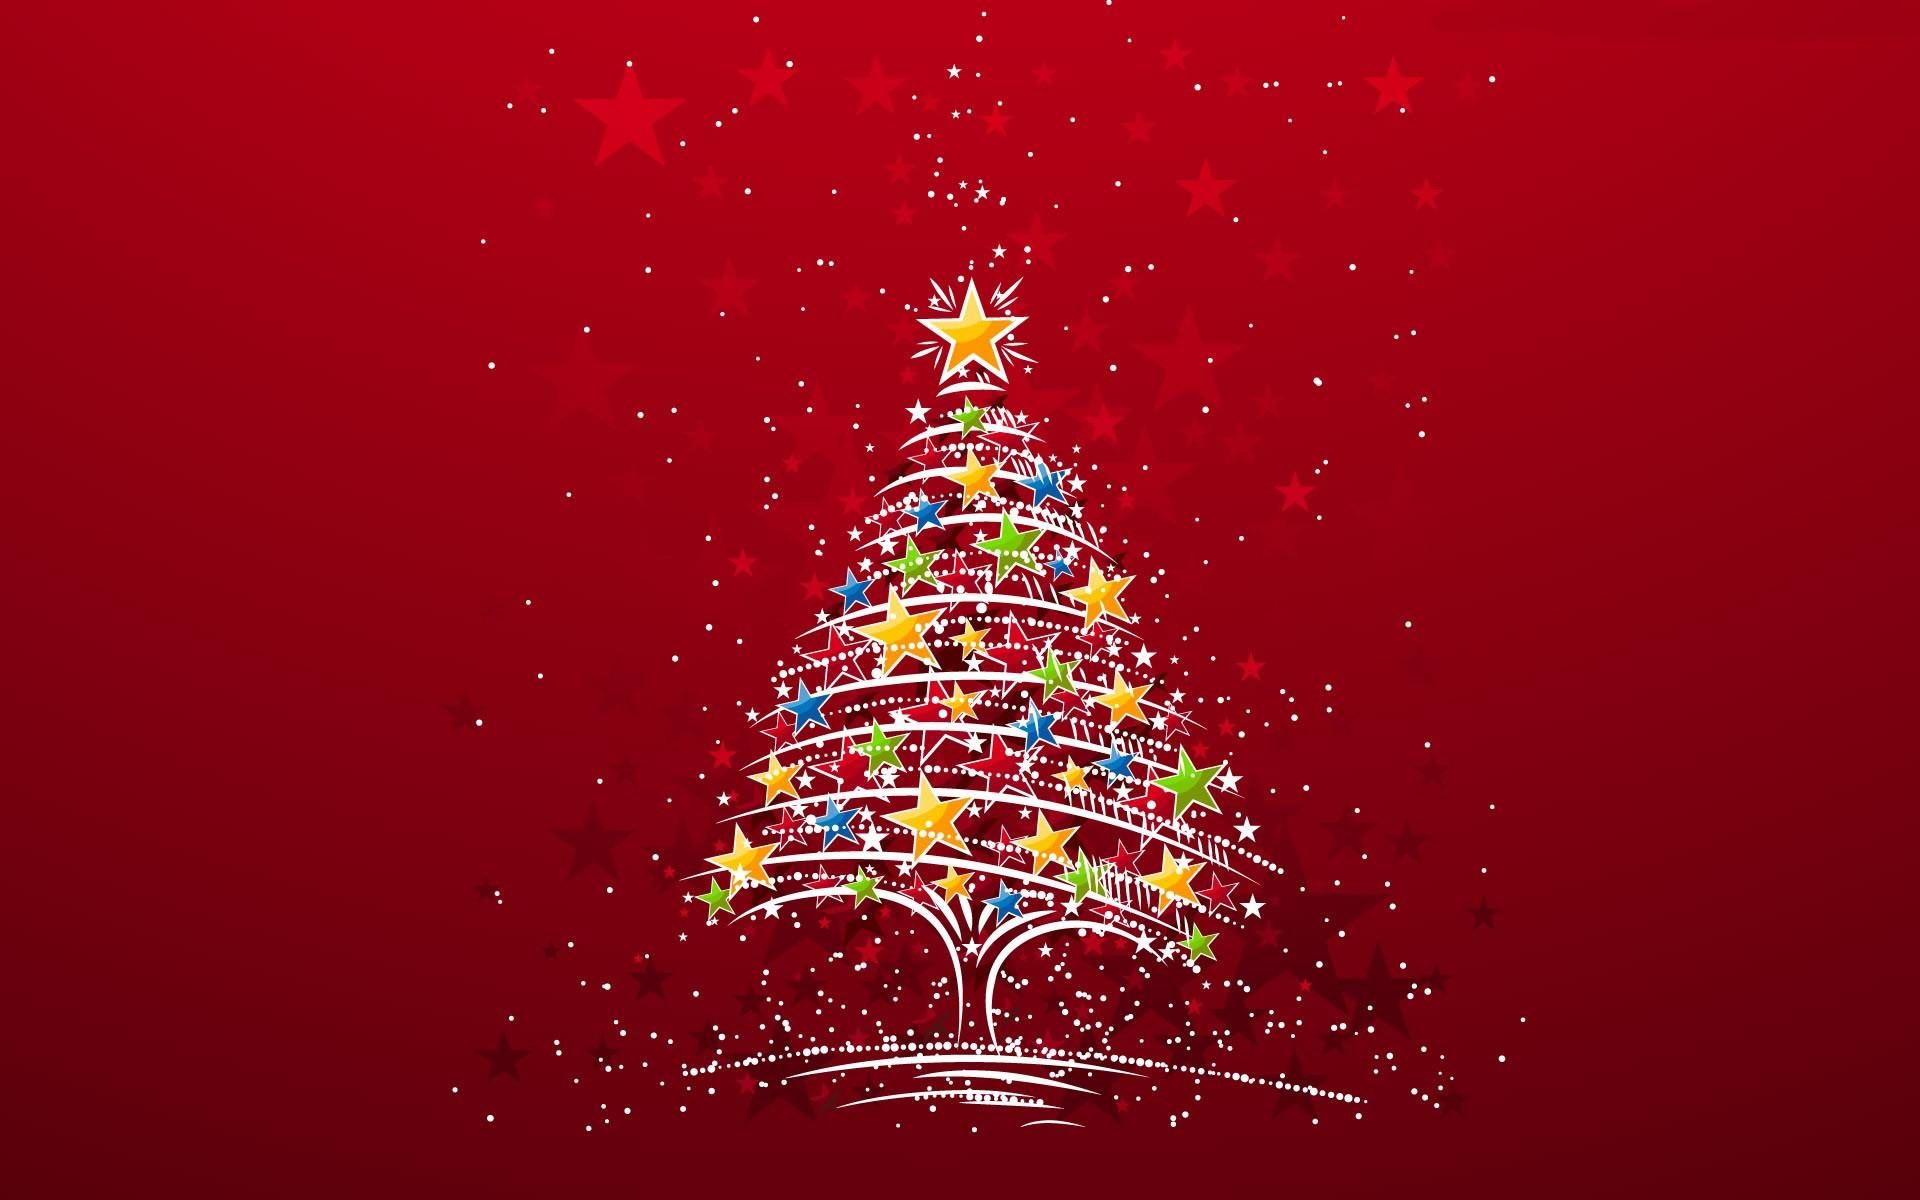 55 Animated Christmas Wallpapers For Desktop